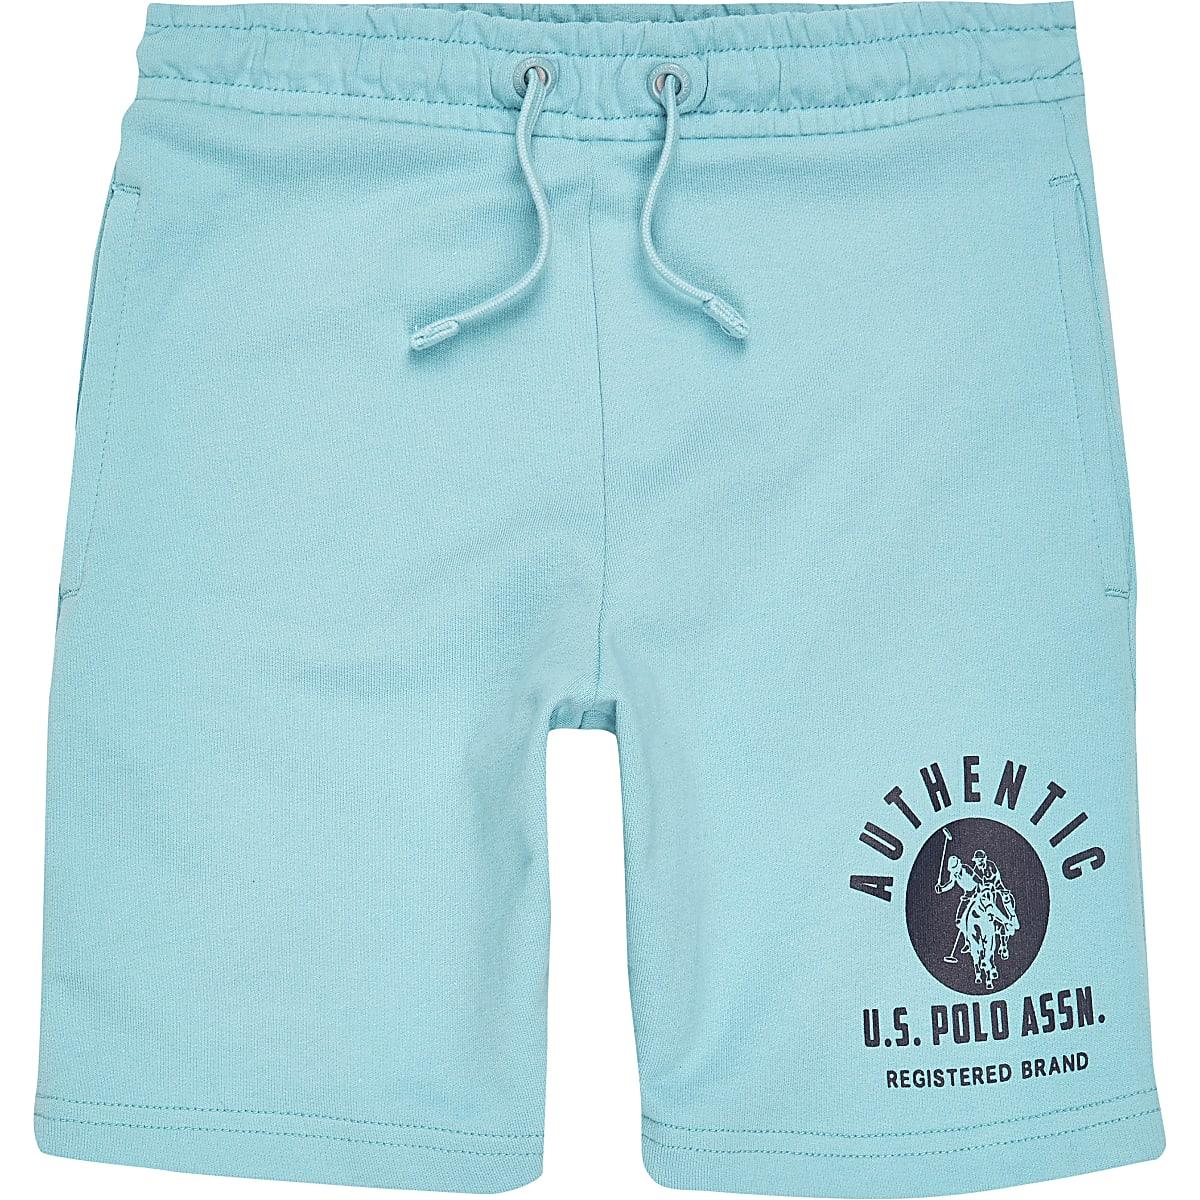 Boys U.S. Polo Assn. blue shorts